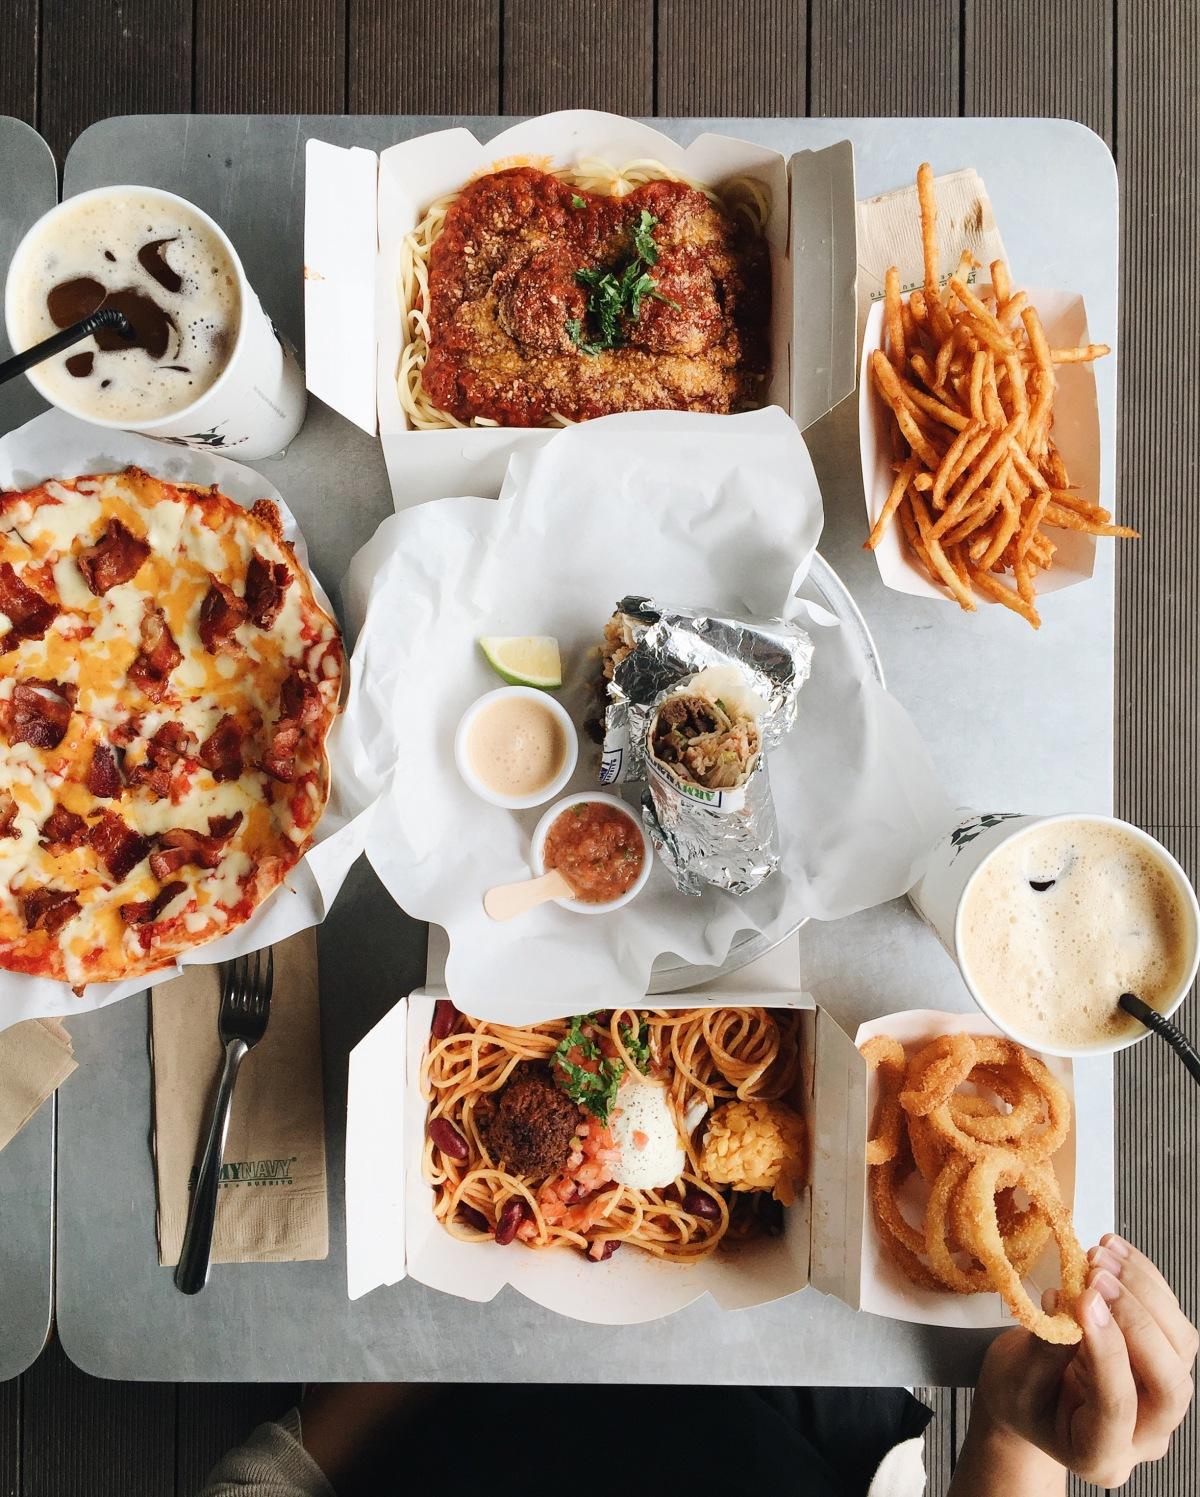 [NEW] Mextiza Pasta byArmyNavy